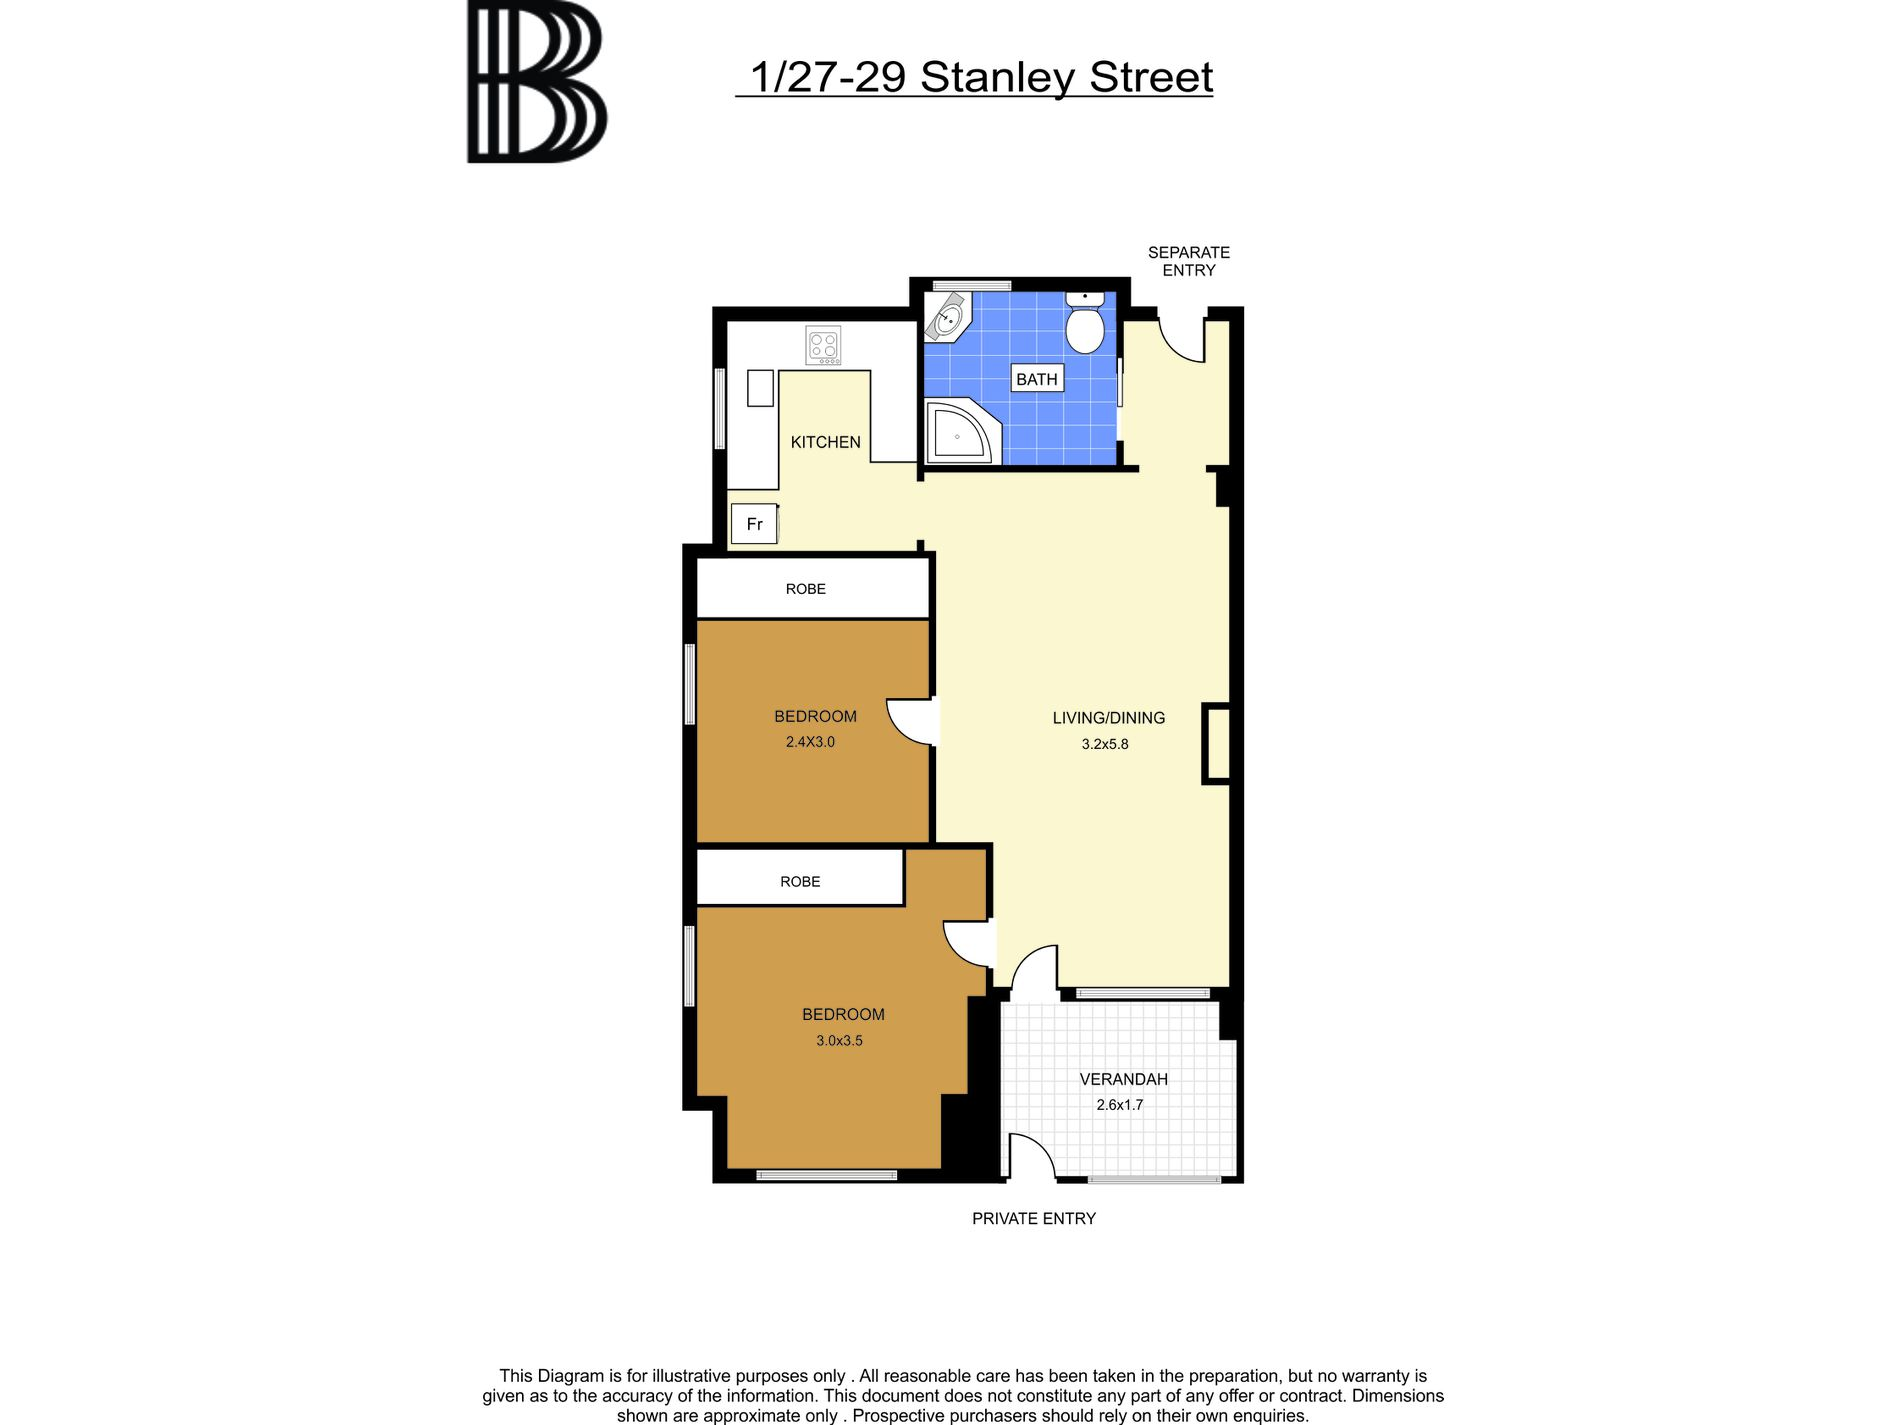 1 / 27-29 Stanley Street, Darlinghurst